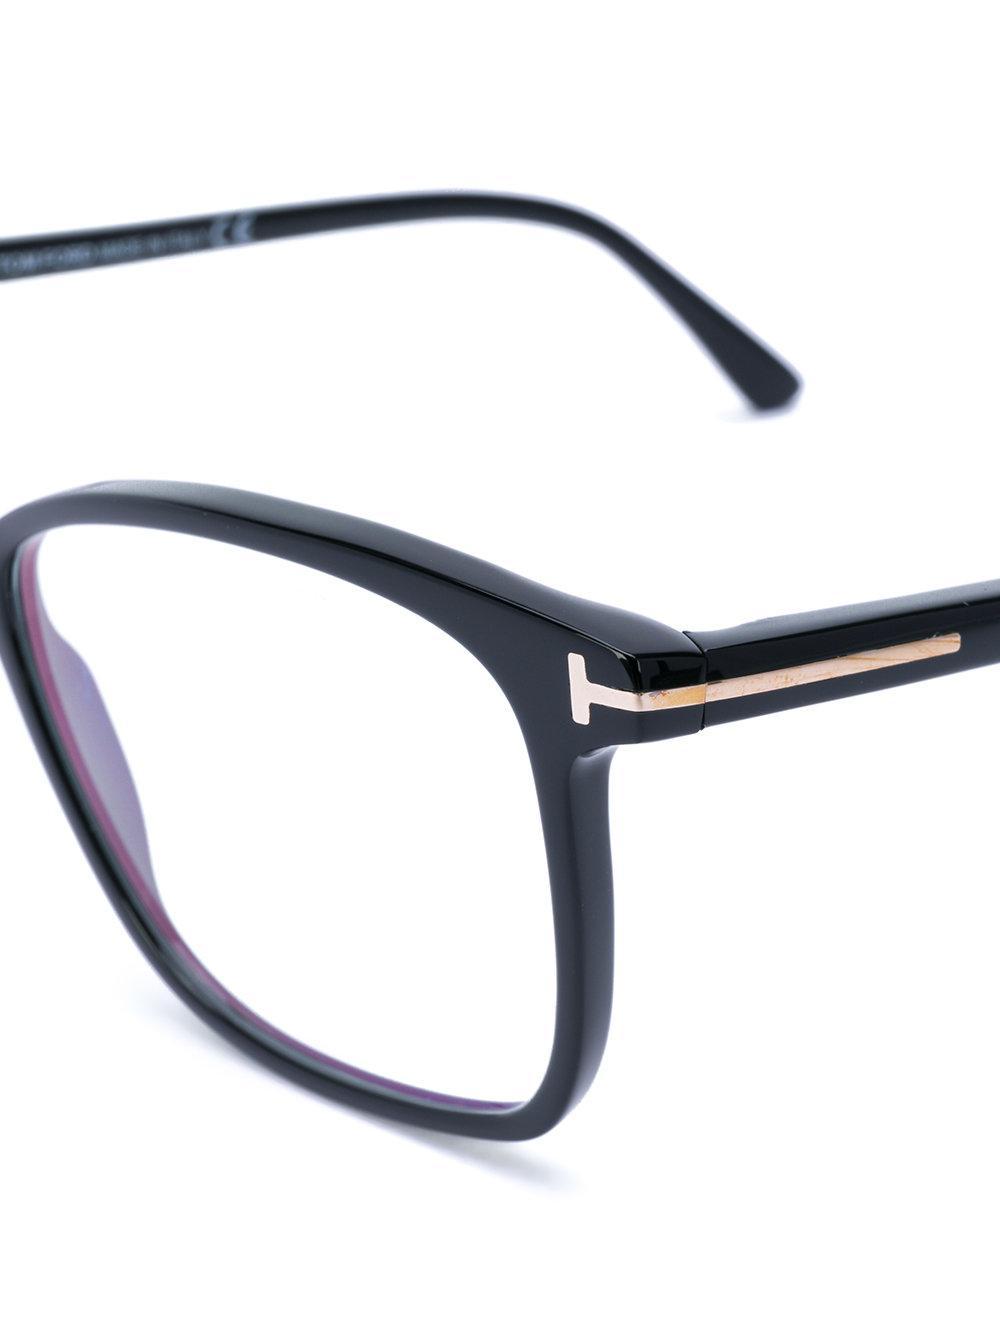 95db53ce55 Tom Ford Tf5478b Glasses in Black for Men - Lyst